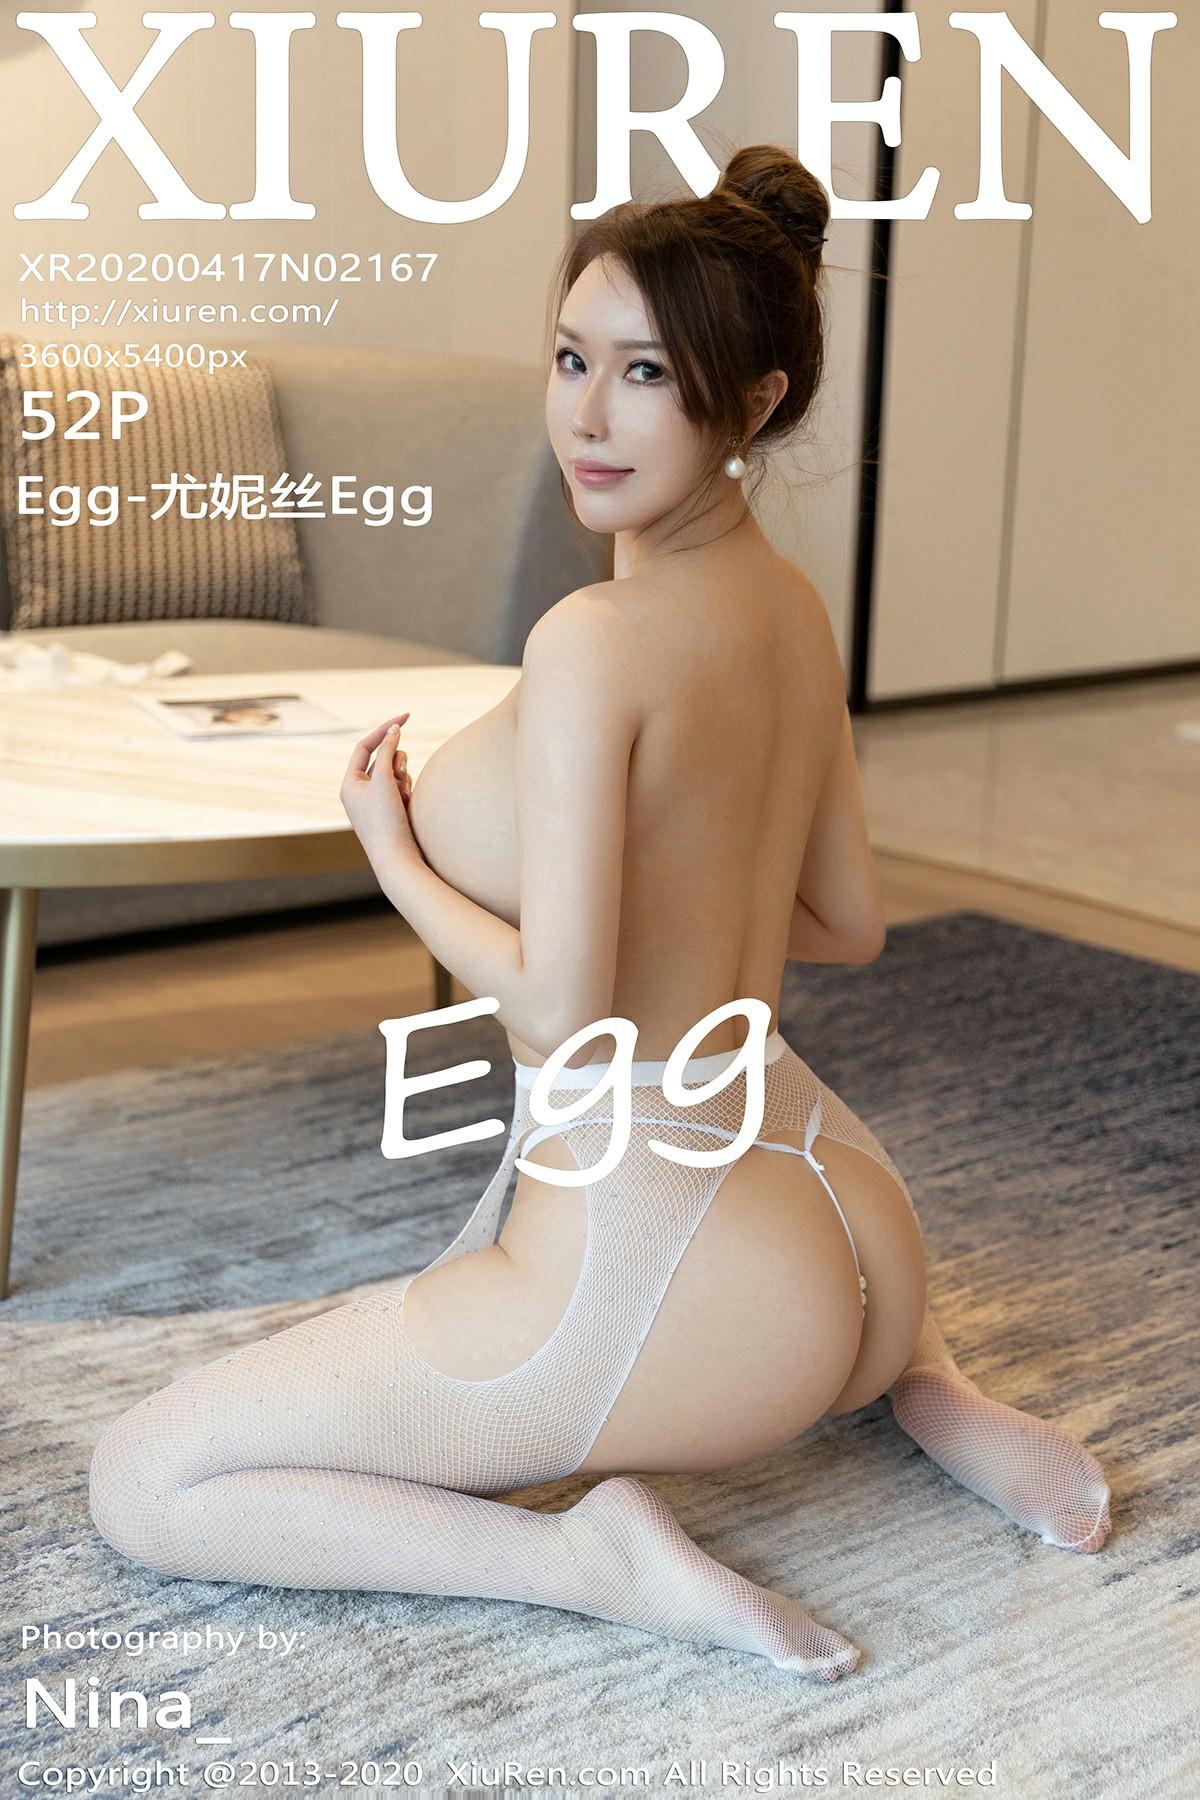 [XiuRen秀人网]2020.04.17 No.2167 Egg 尤妮丝Egg[53P] 秀人网 第1张